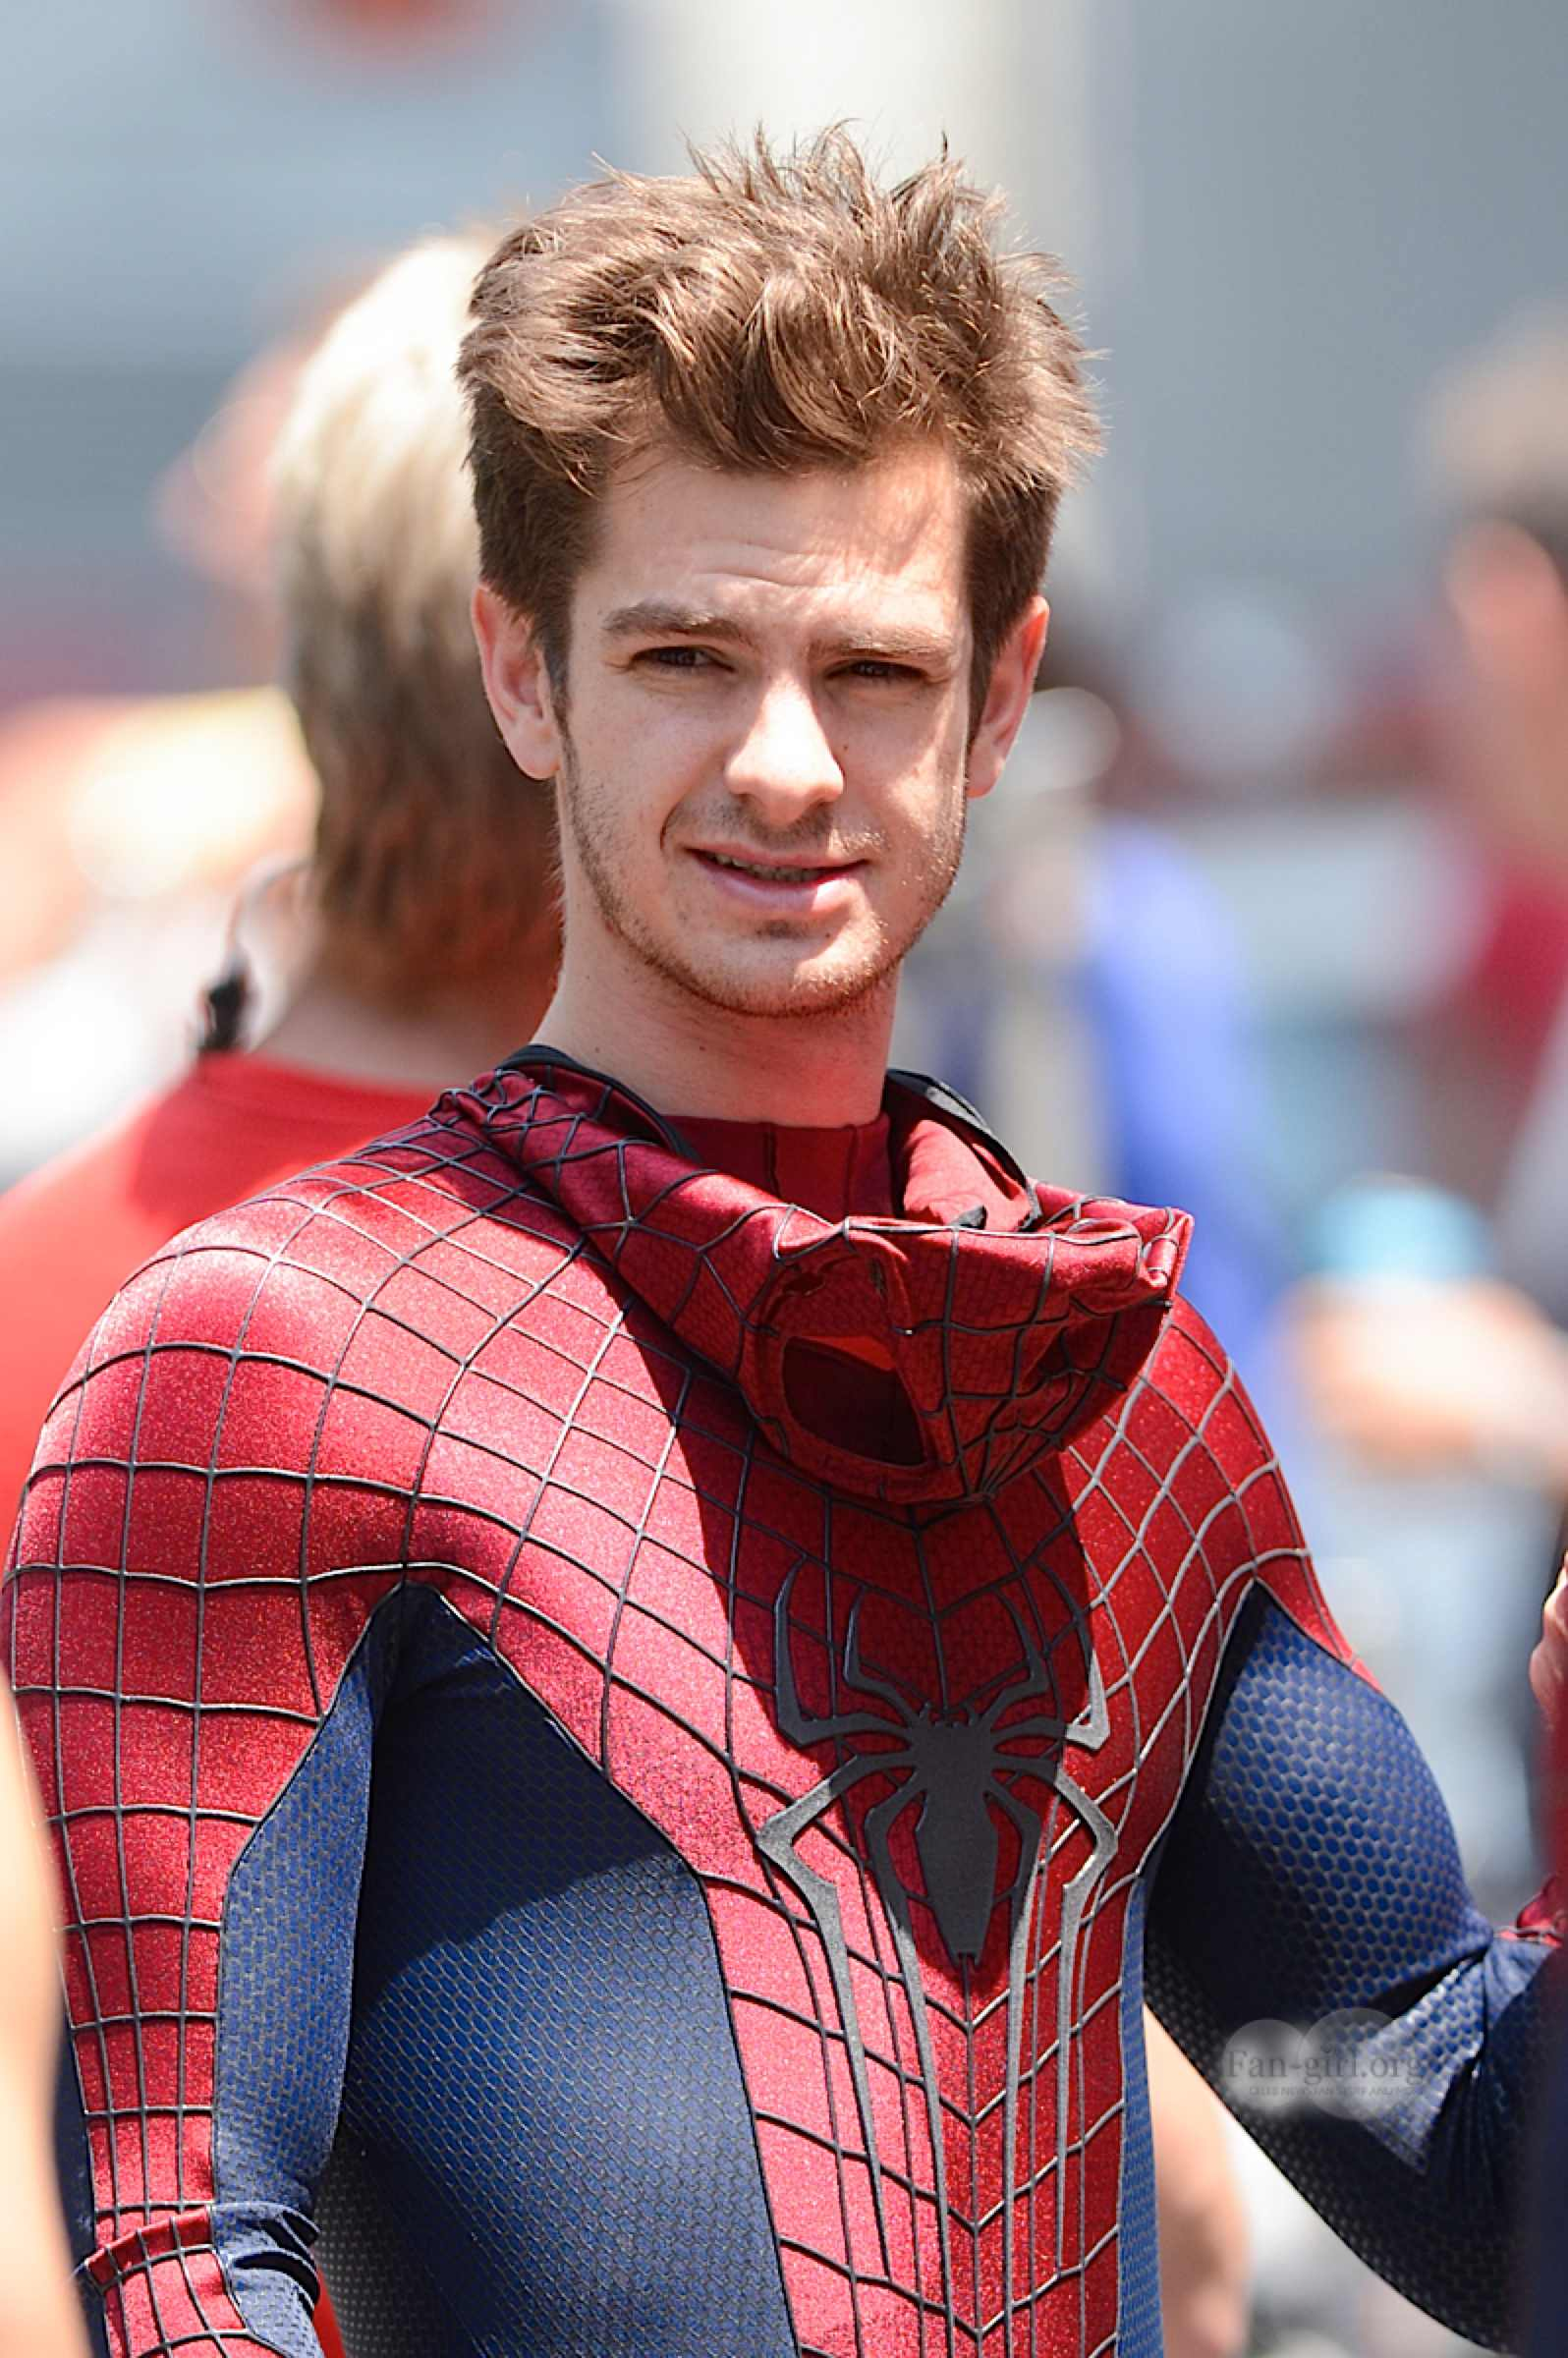 Andrew Garfield - Spider-Man - Top 10 Sexiest, Hottest Superheroes